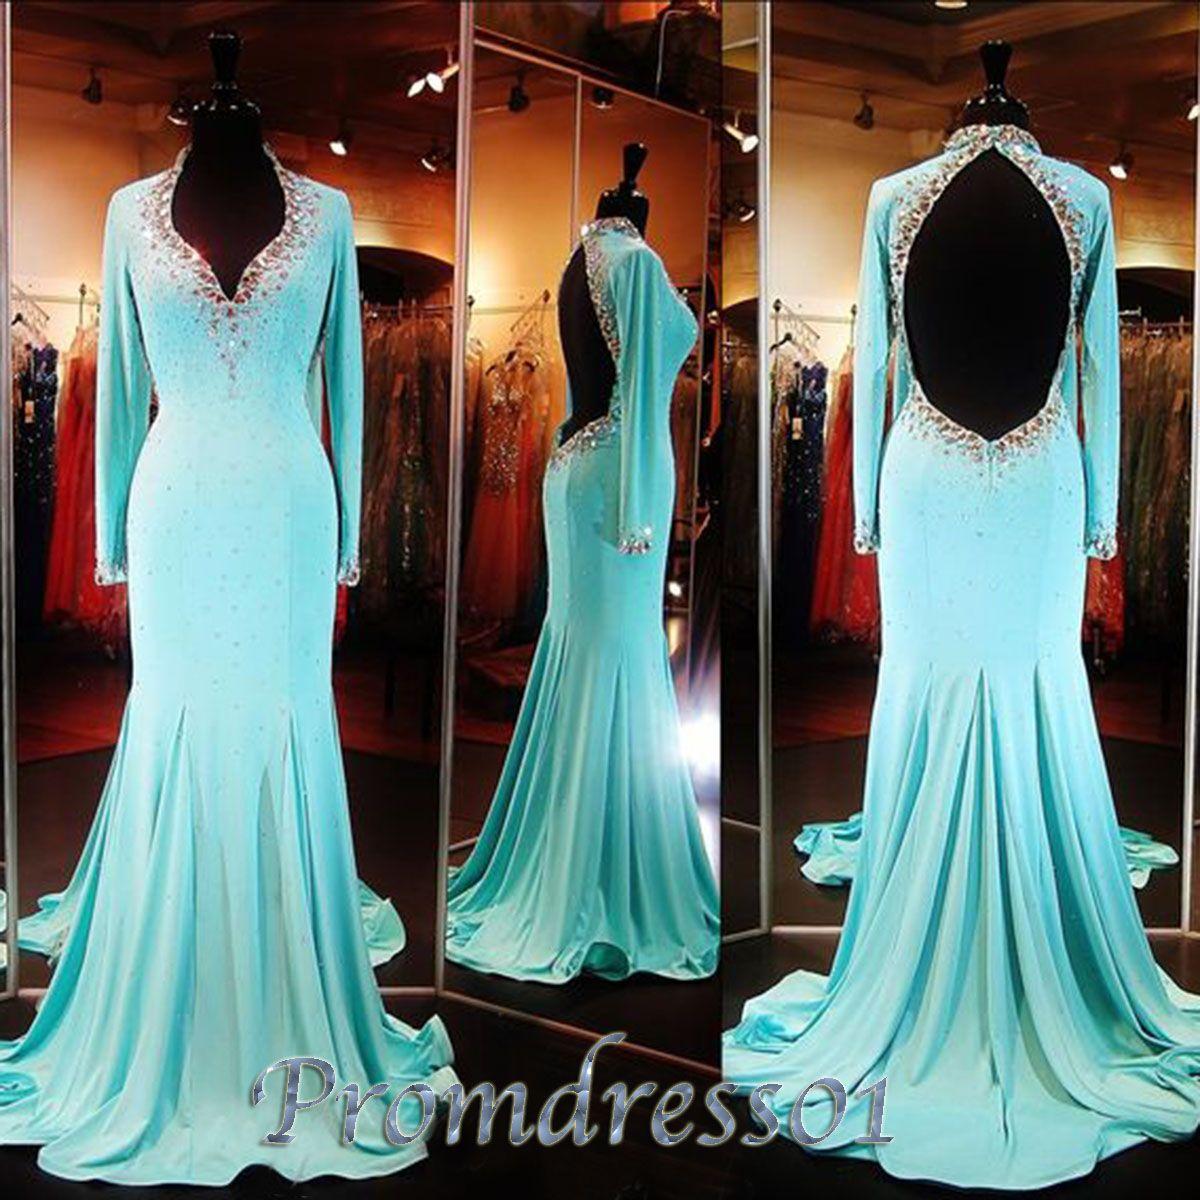 qpromdress: Elegant ¾ sleeves open back prom dress | *~ Fairytales ...